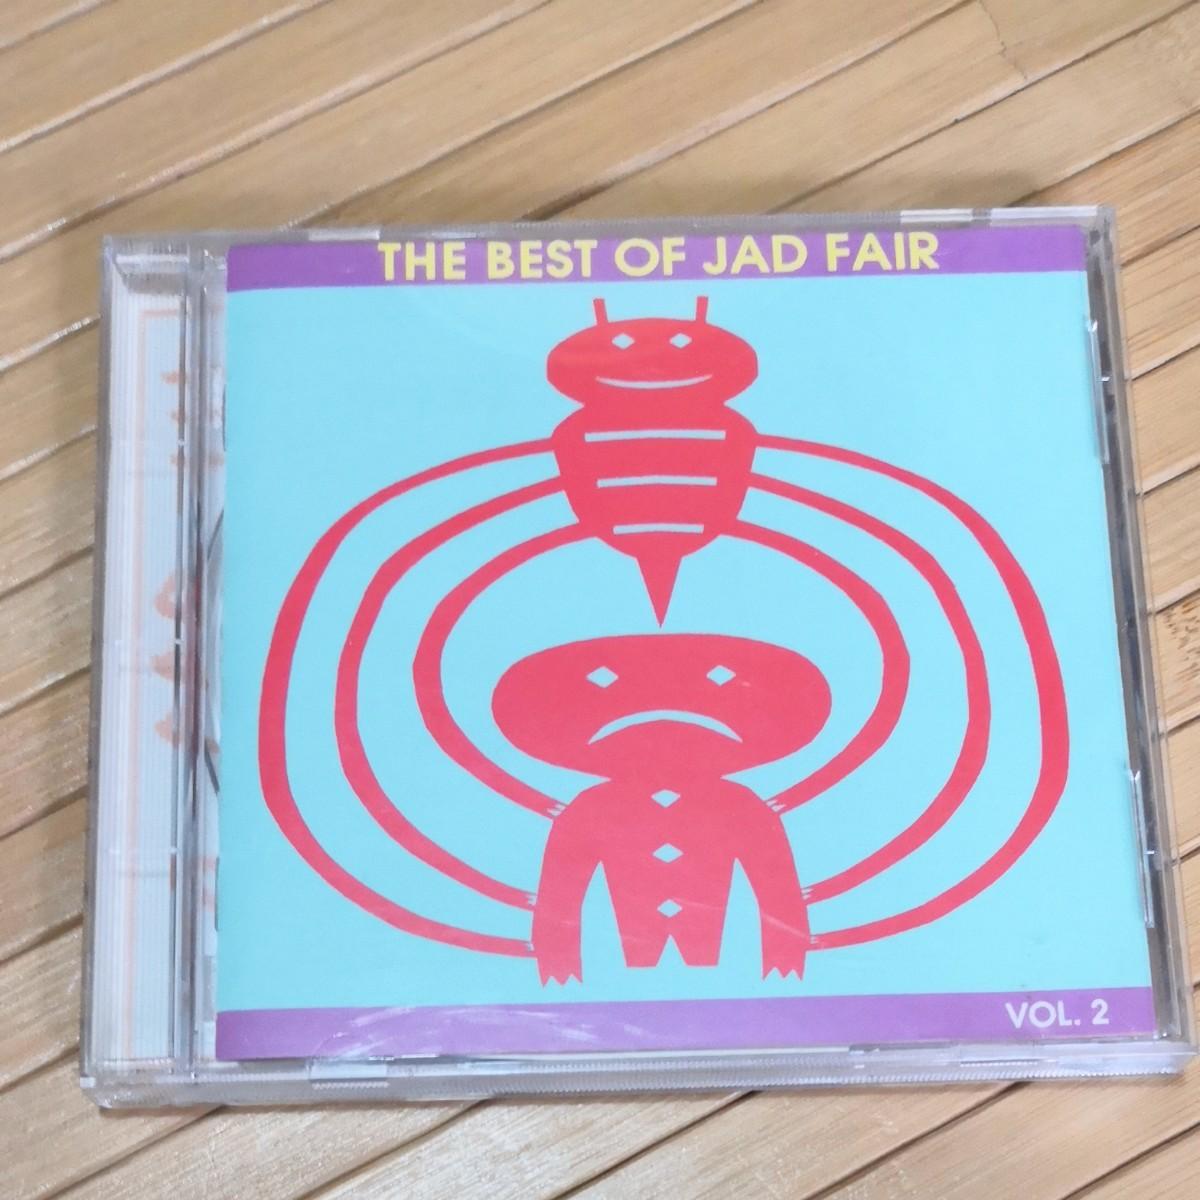 The Beat Of Jad Fair Vol.2 日本盤 廃盤 中古CD